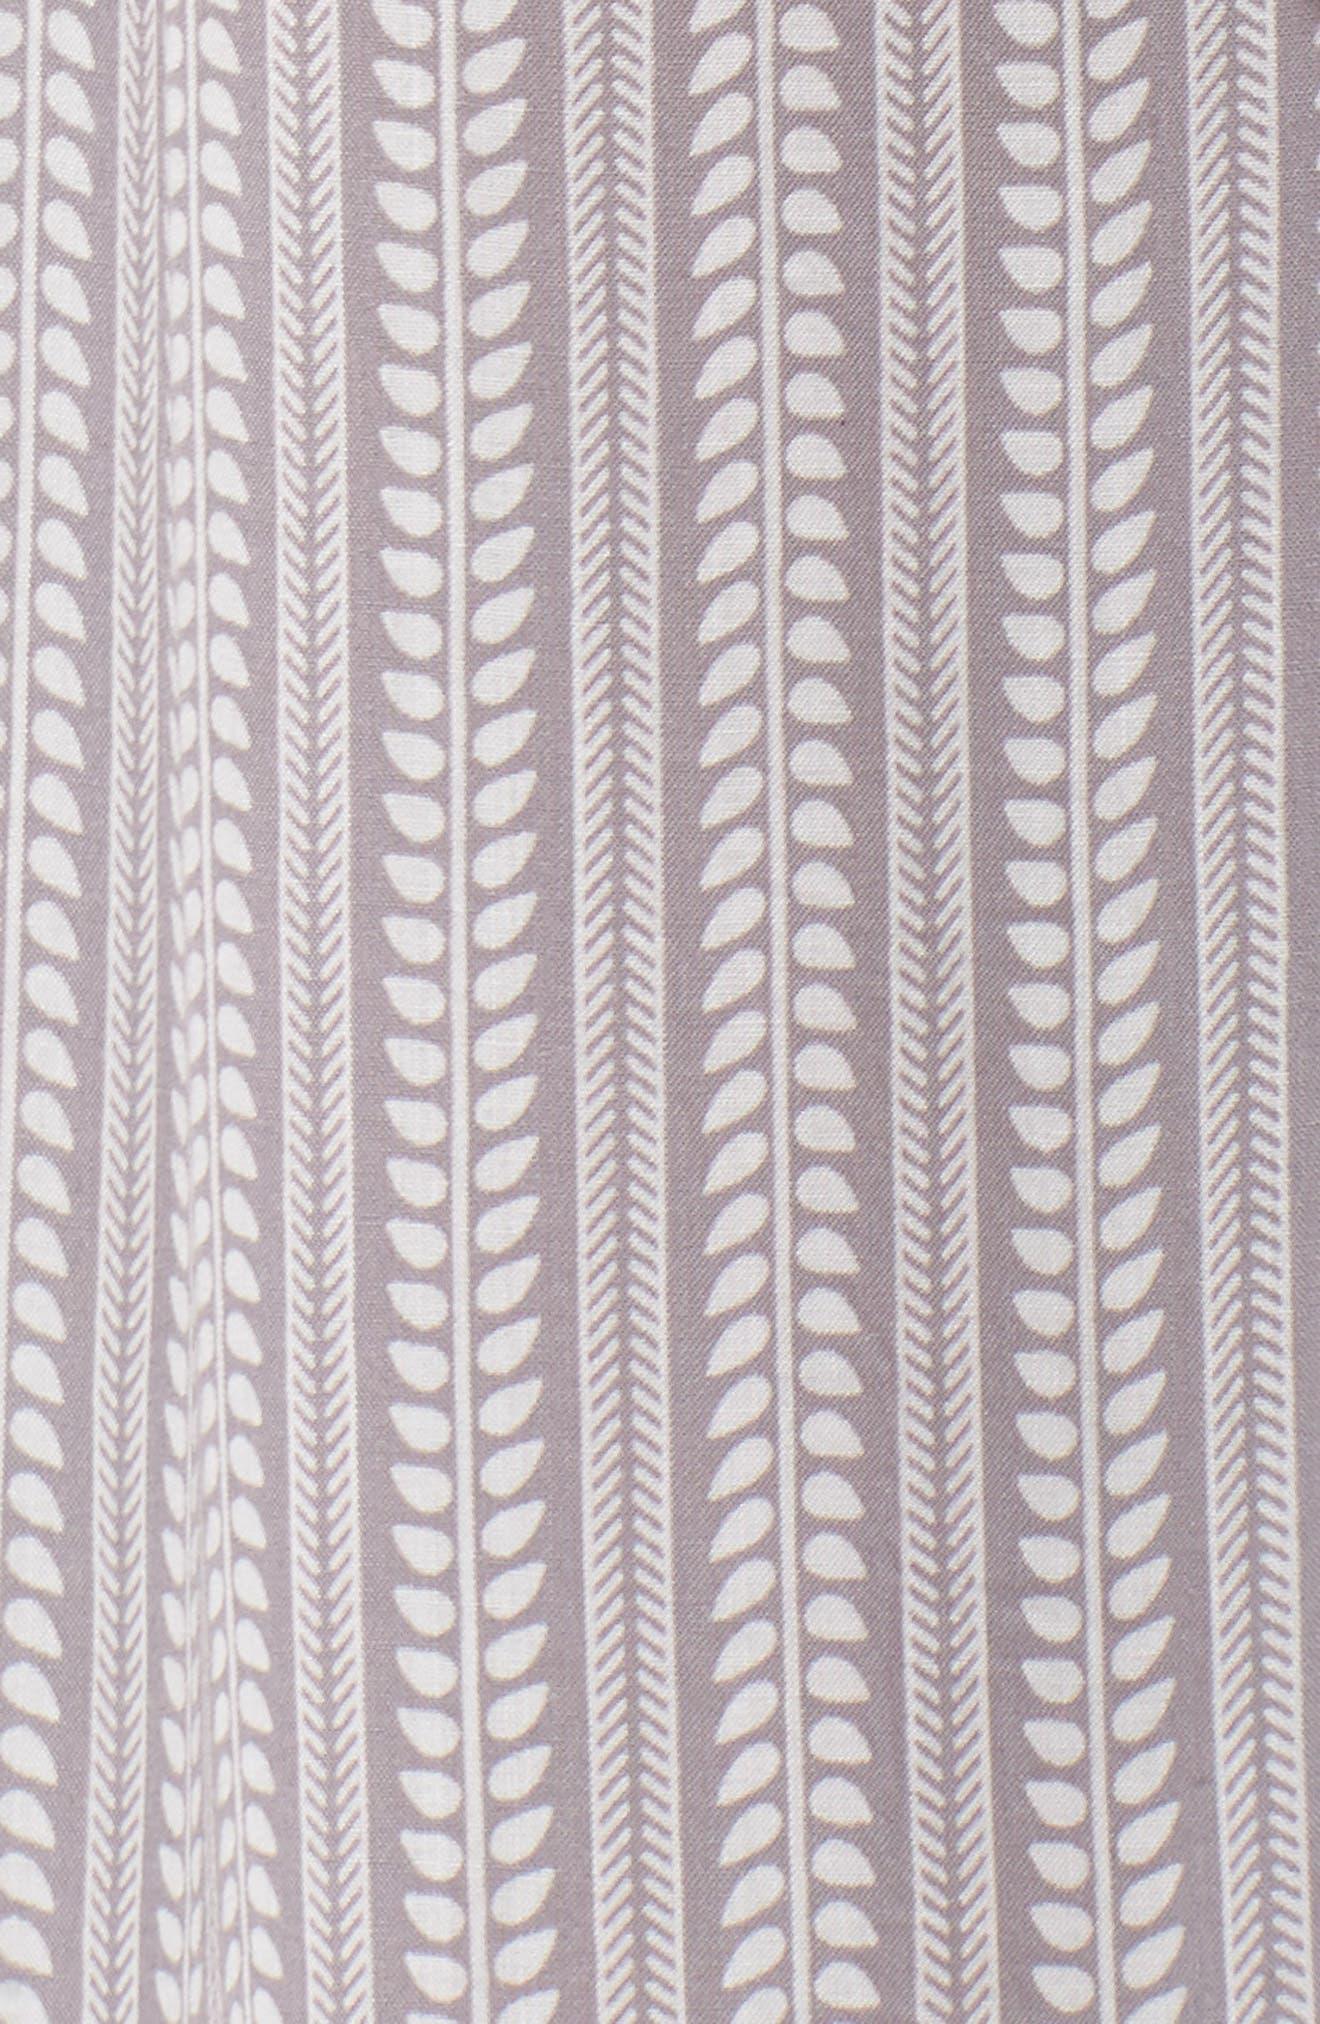 Wrap Maxi Cover-Up Dress,                             Alternate thumbnail 9, color,